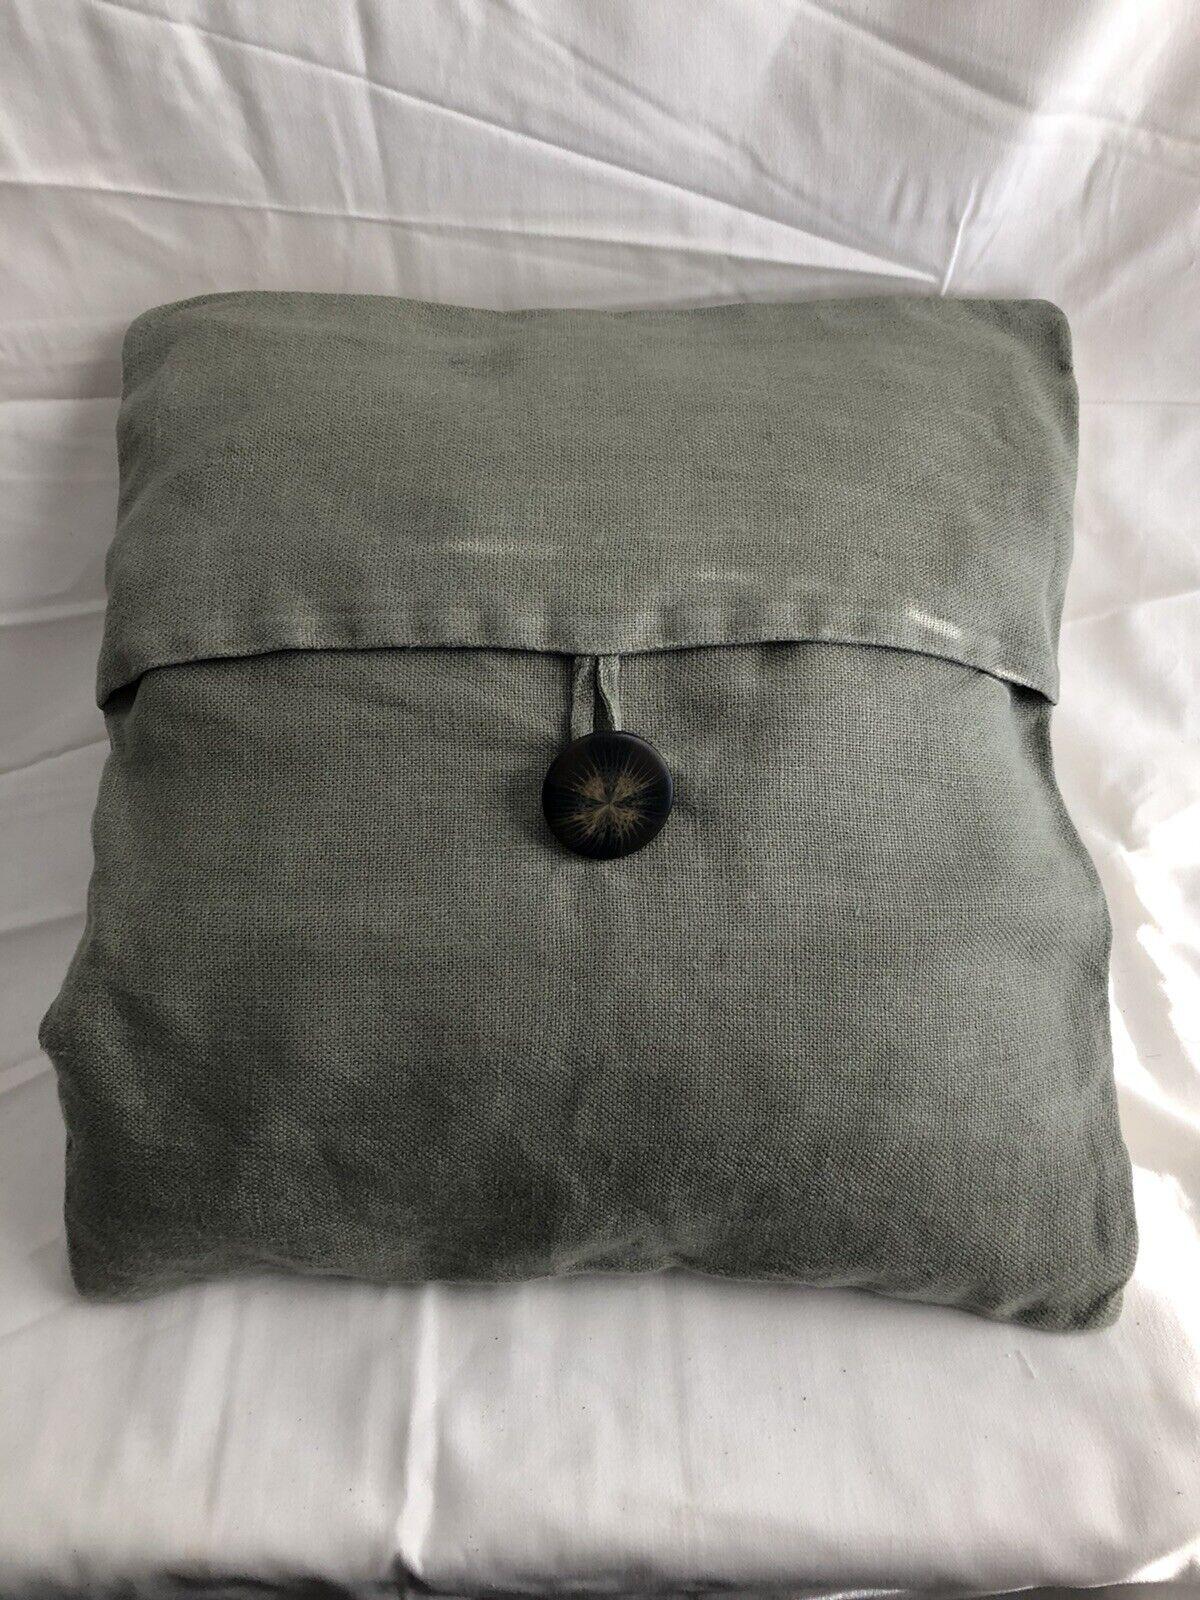 Pottery barn London Pillow W//insert 16x26 EUC